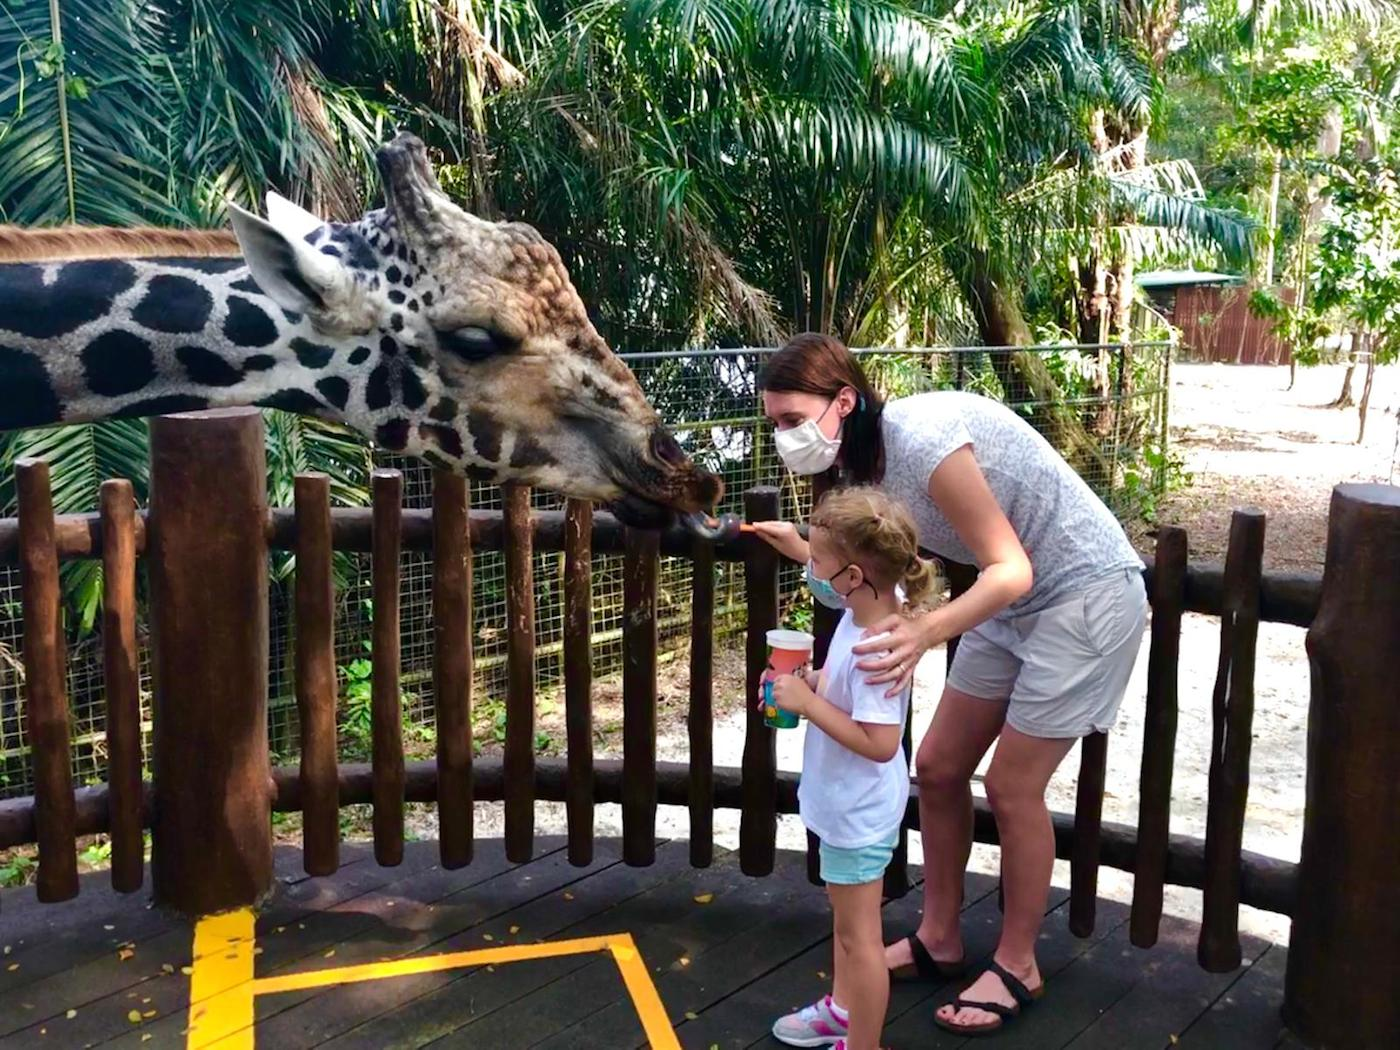 visiting Singapore zoo with kids giraffe feeding